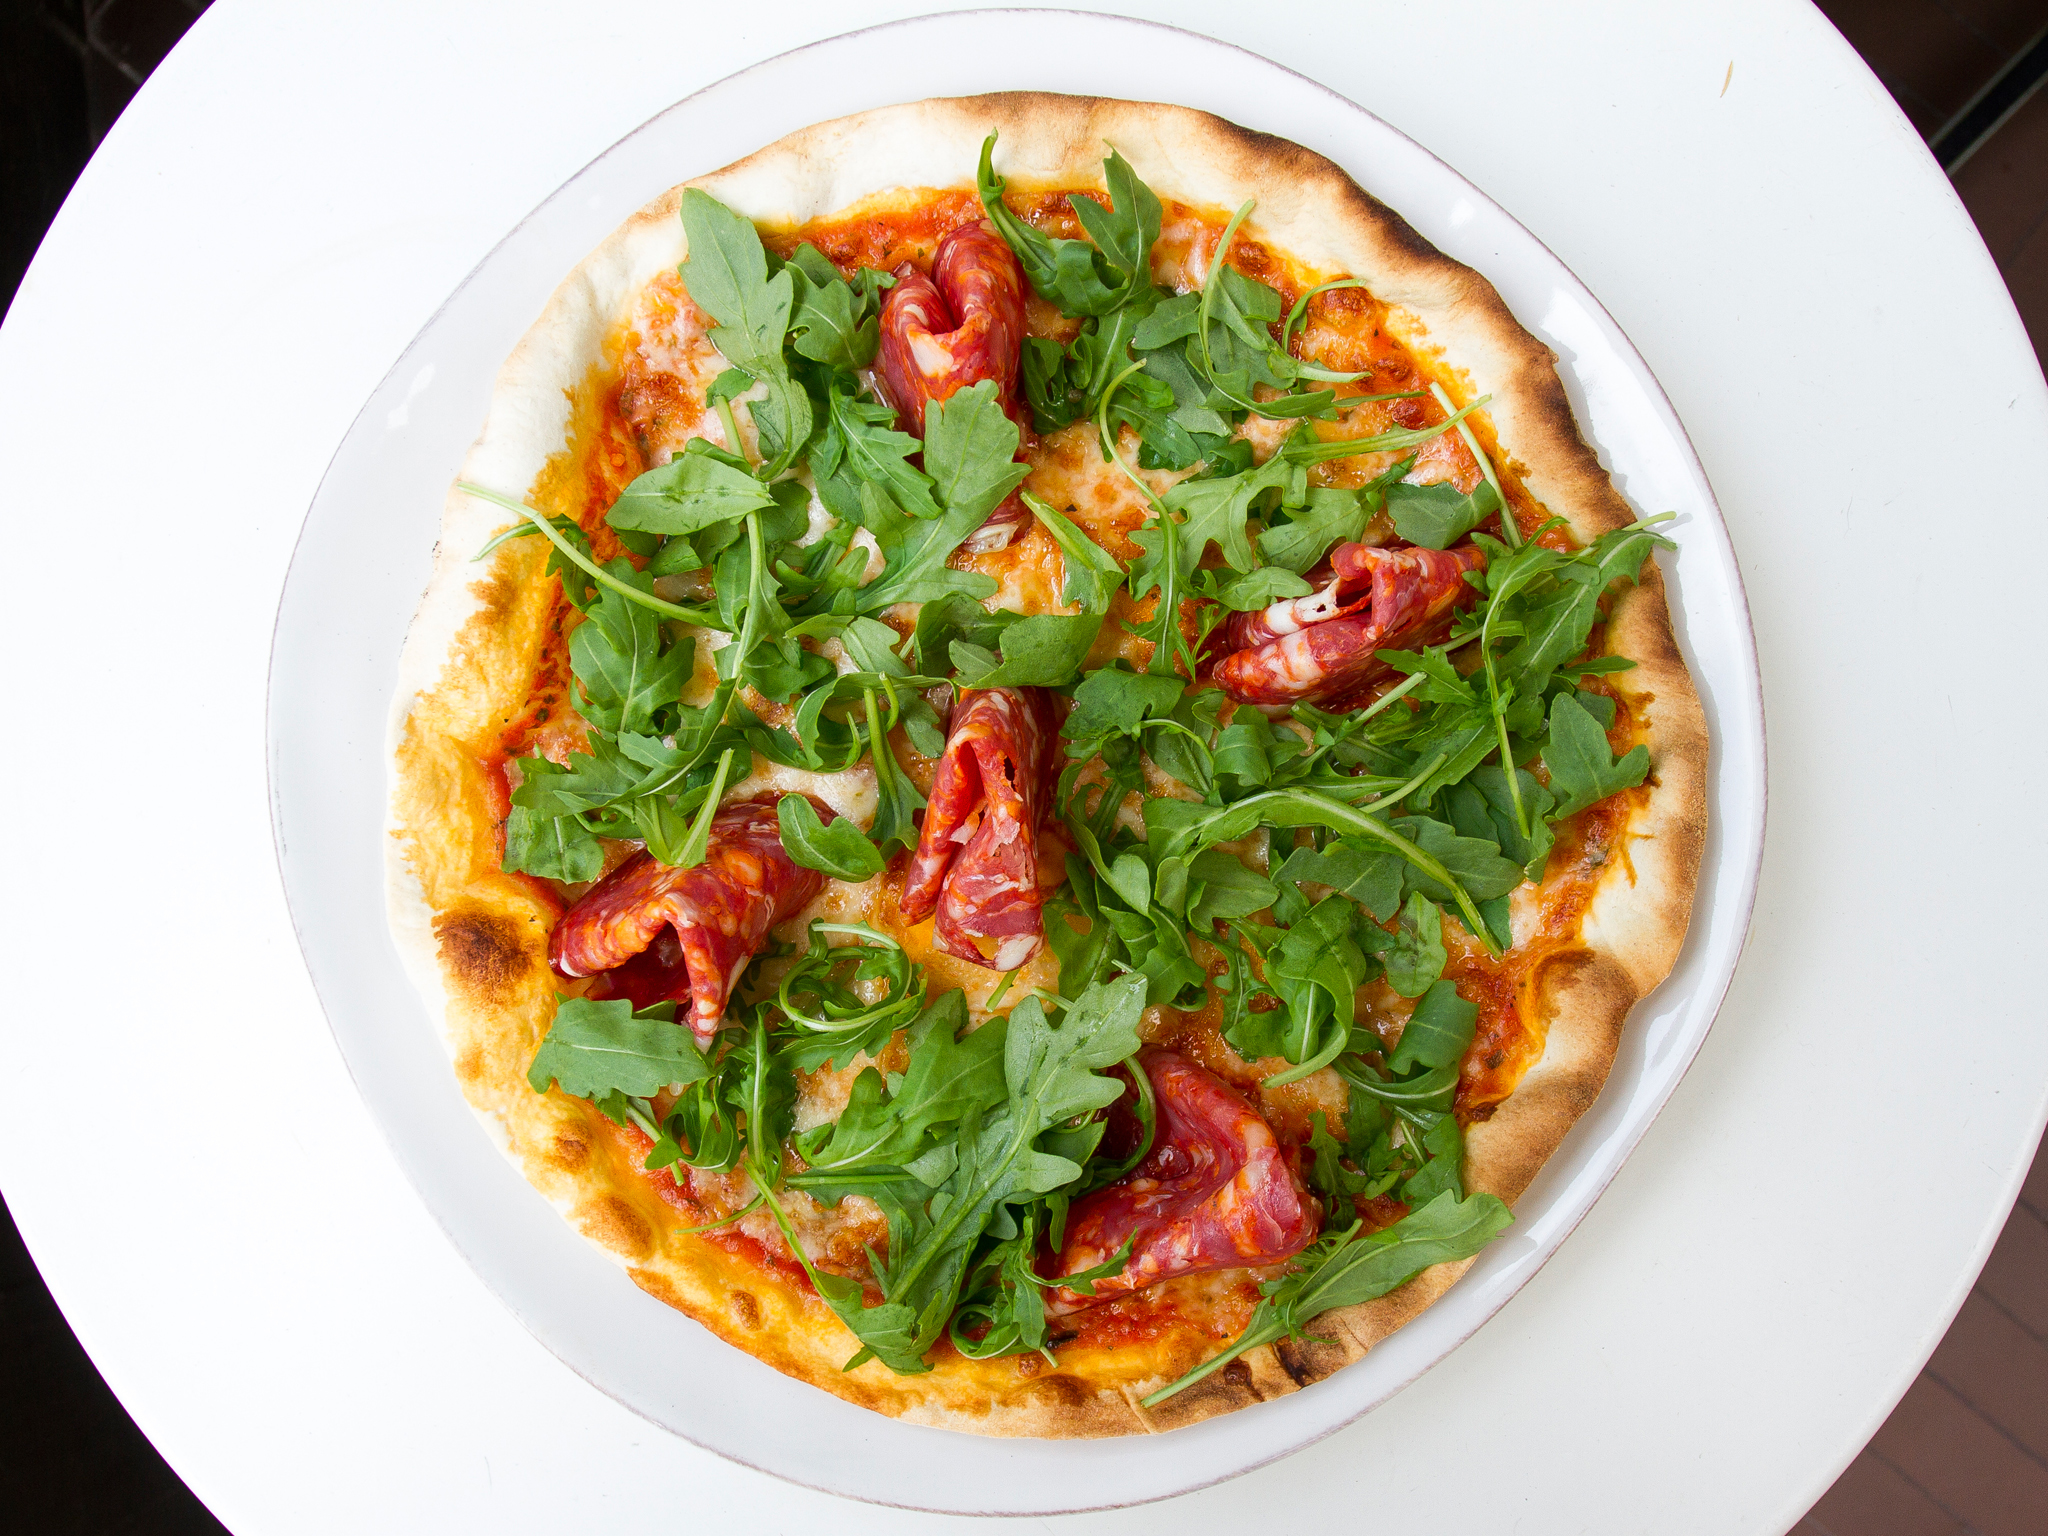 Restaurante, Portarossa, Cozinha Italiana, Pizza